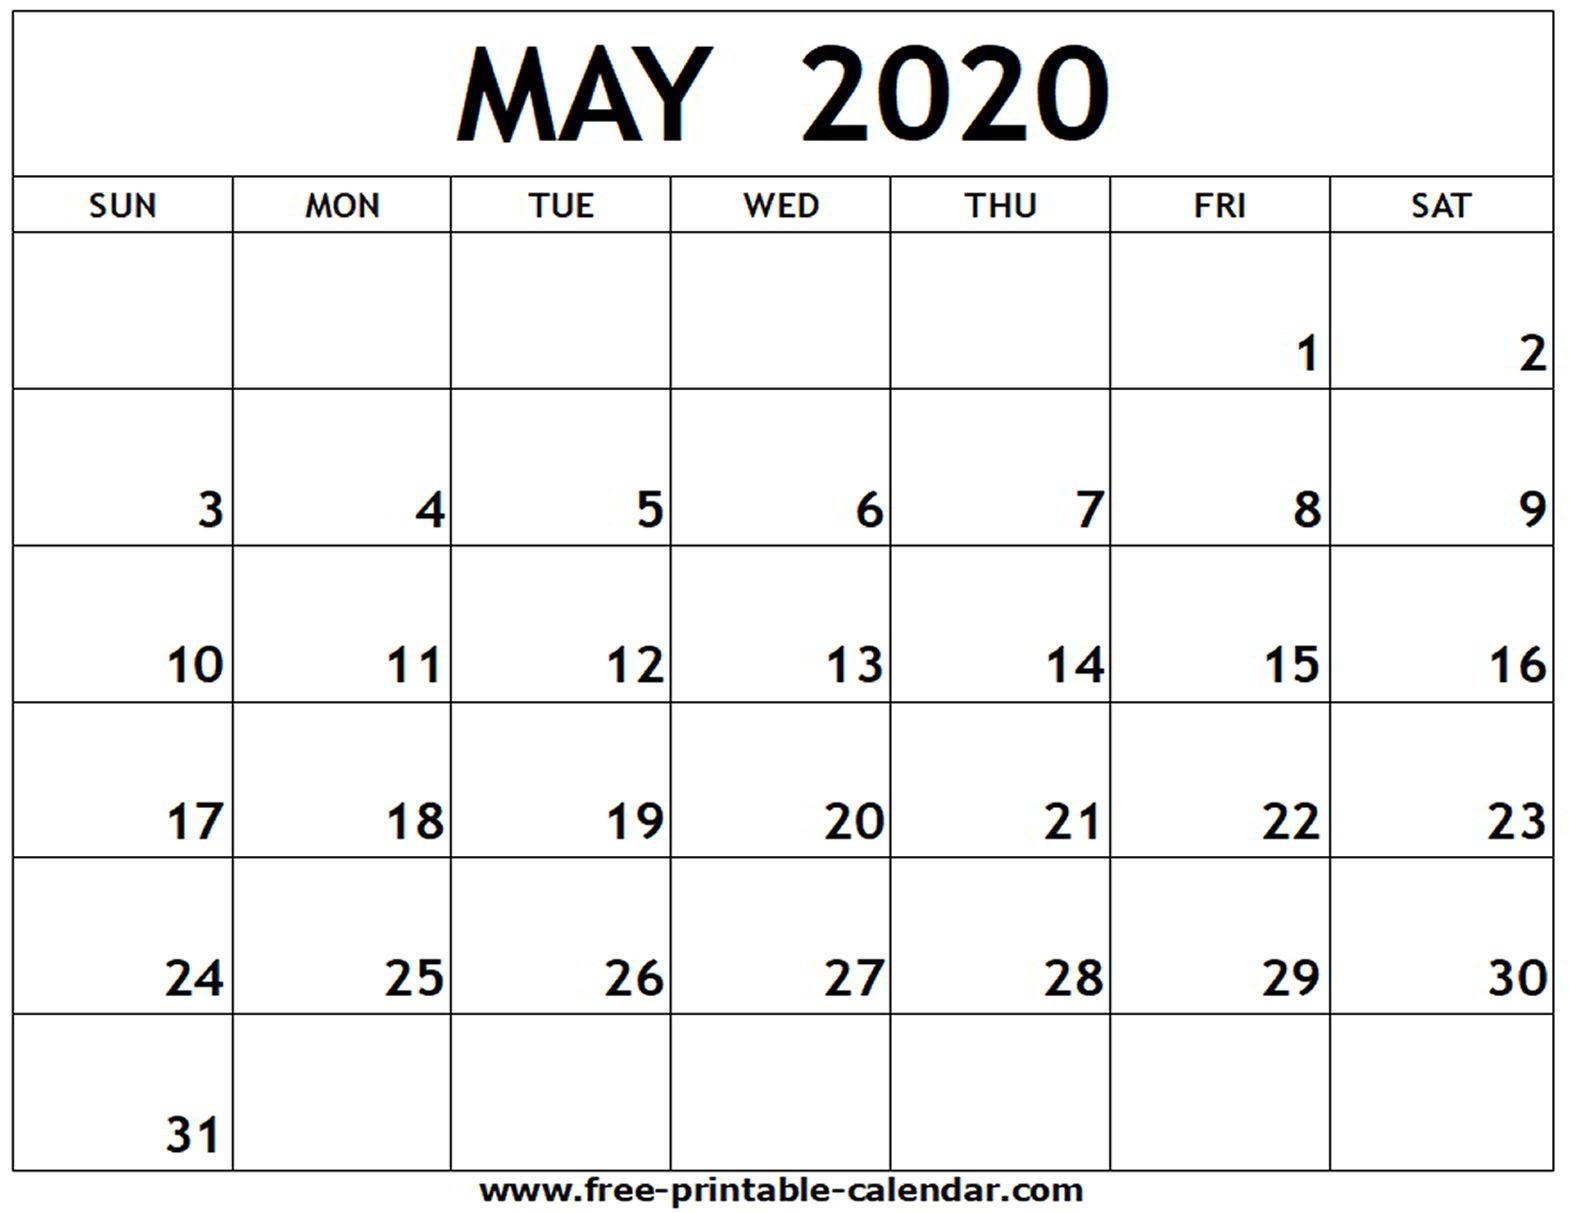 Printable Firefighter Calendar 2020 | Example Calendar  Firefighter Calendar Pdf